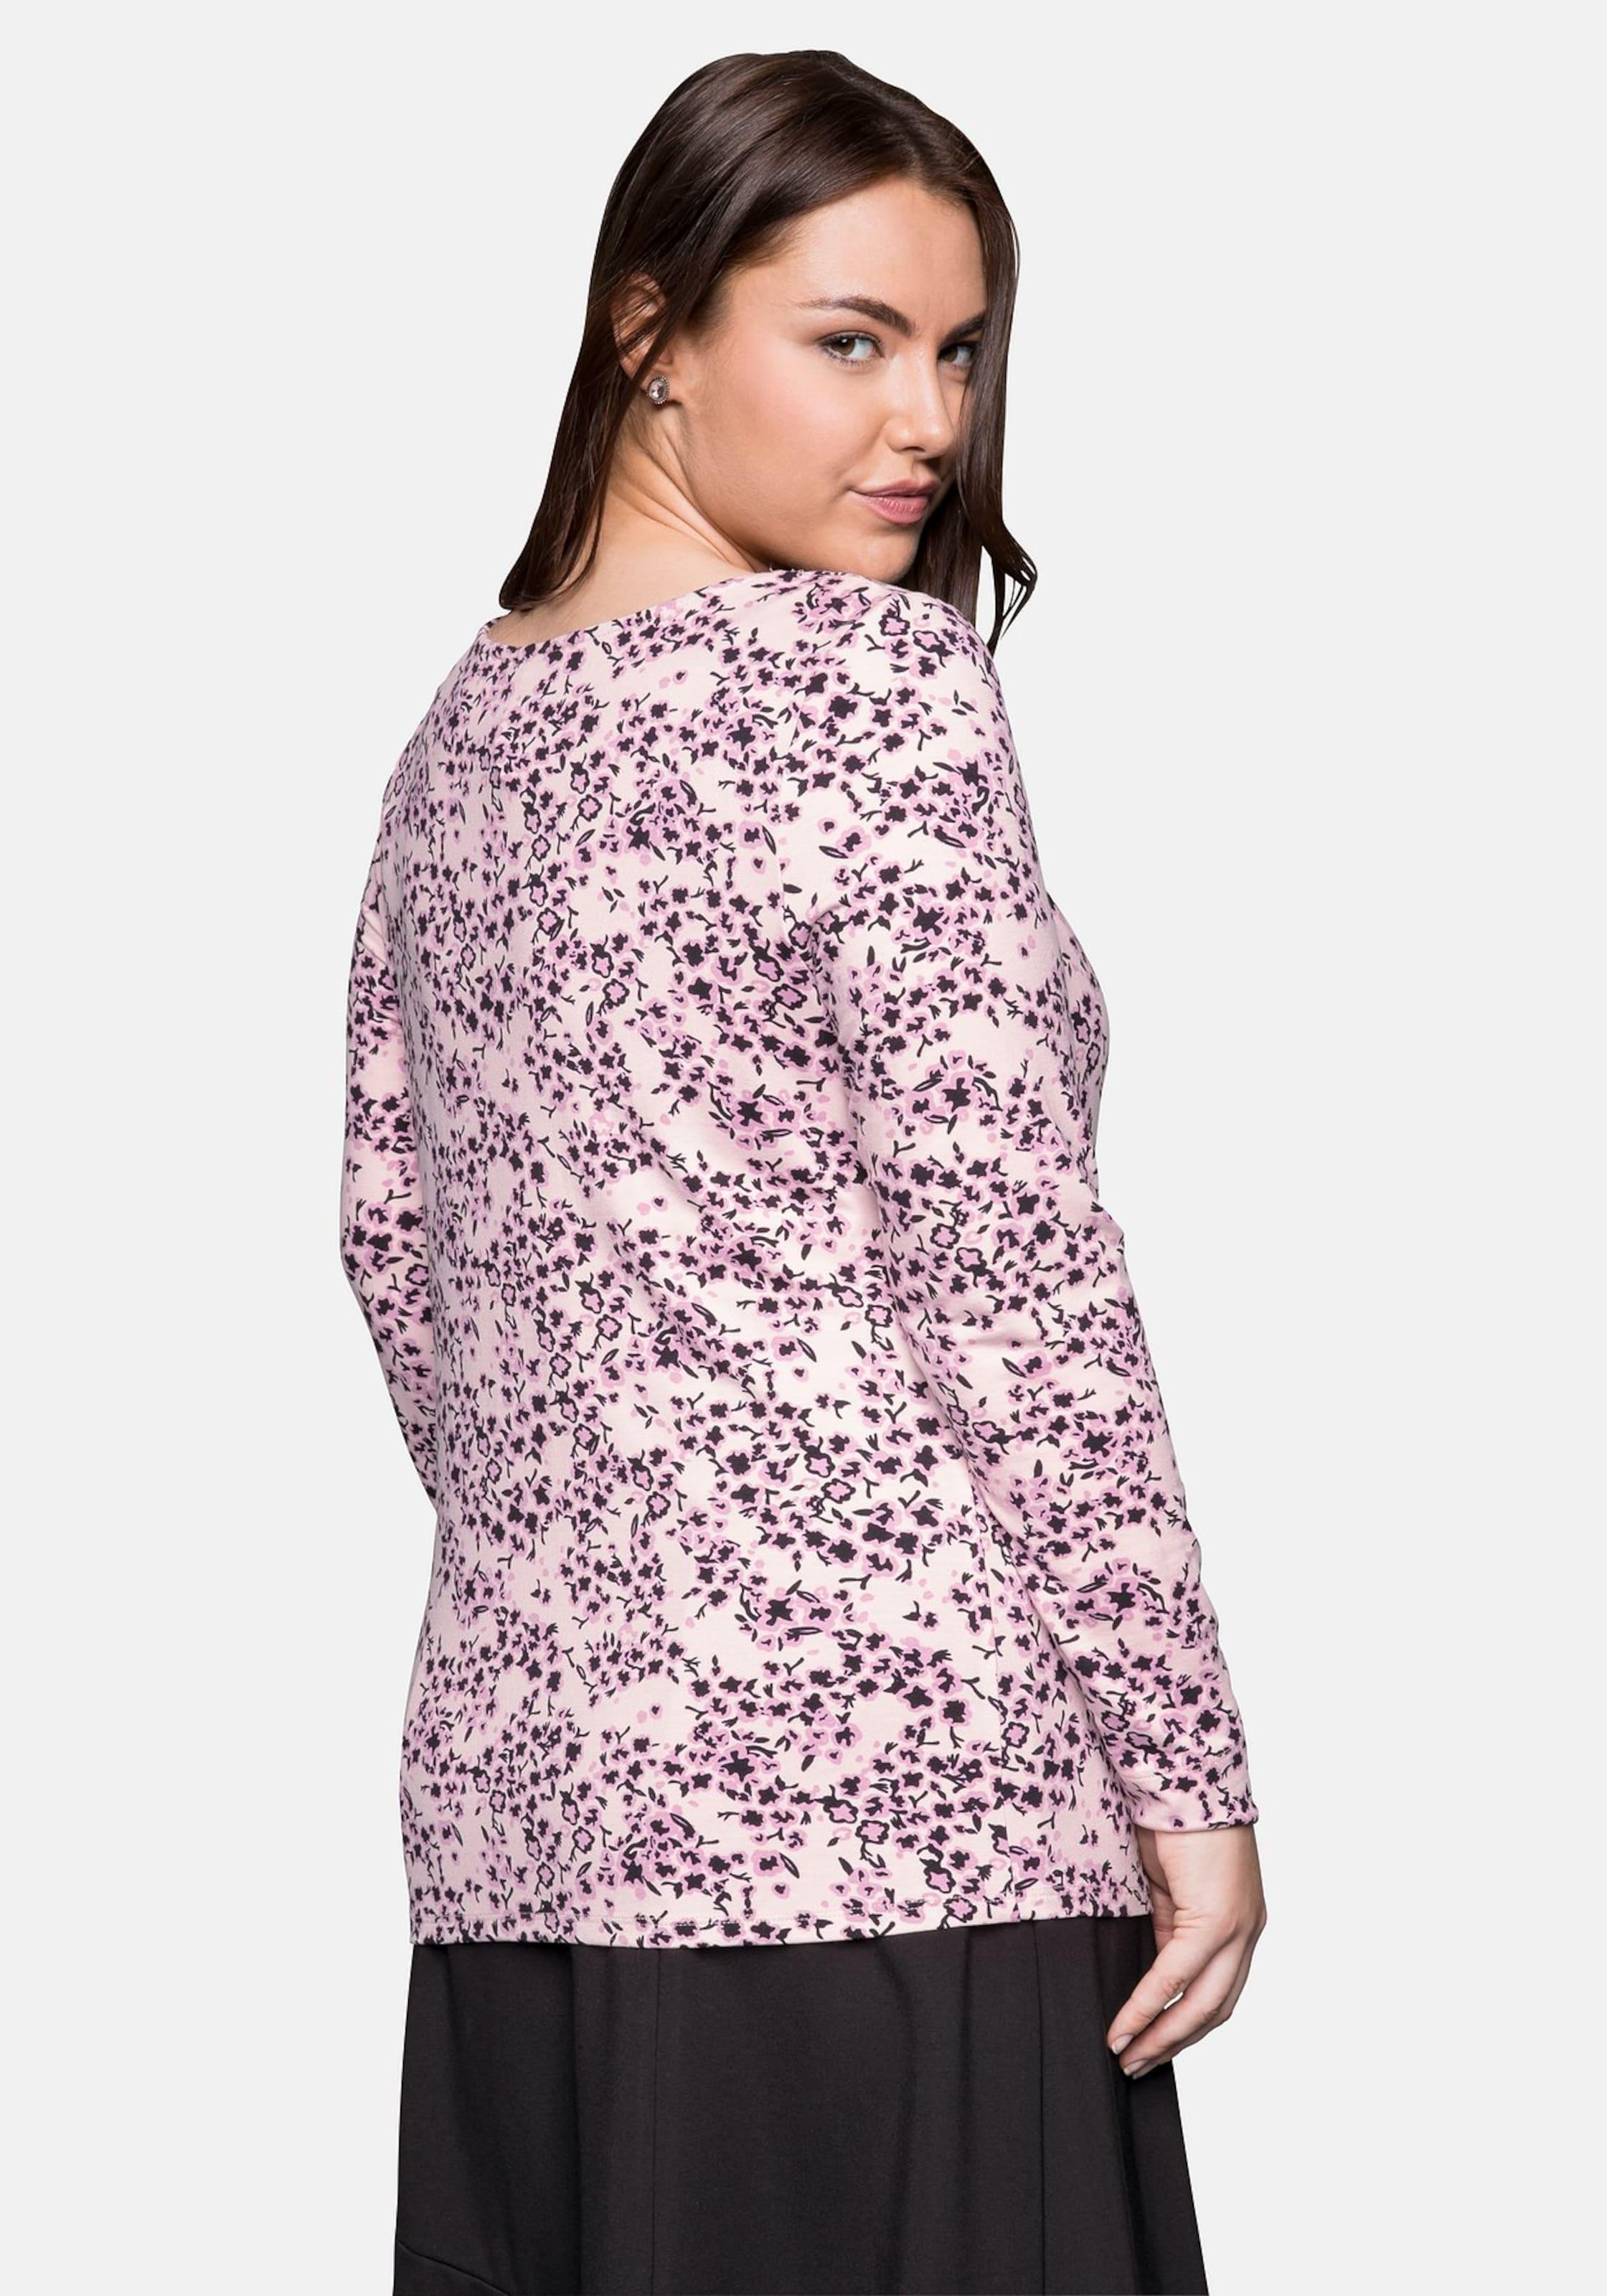 Sheego Shirt In In Sheego Shirt HellpinkSchwarz tdBhxosQrC